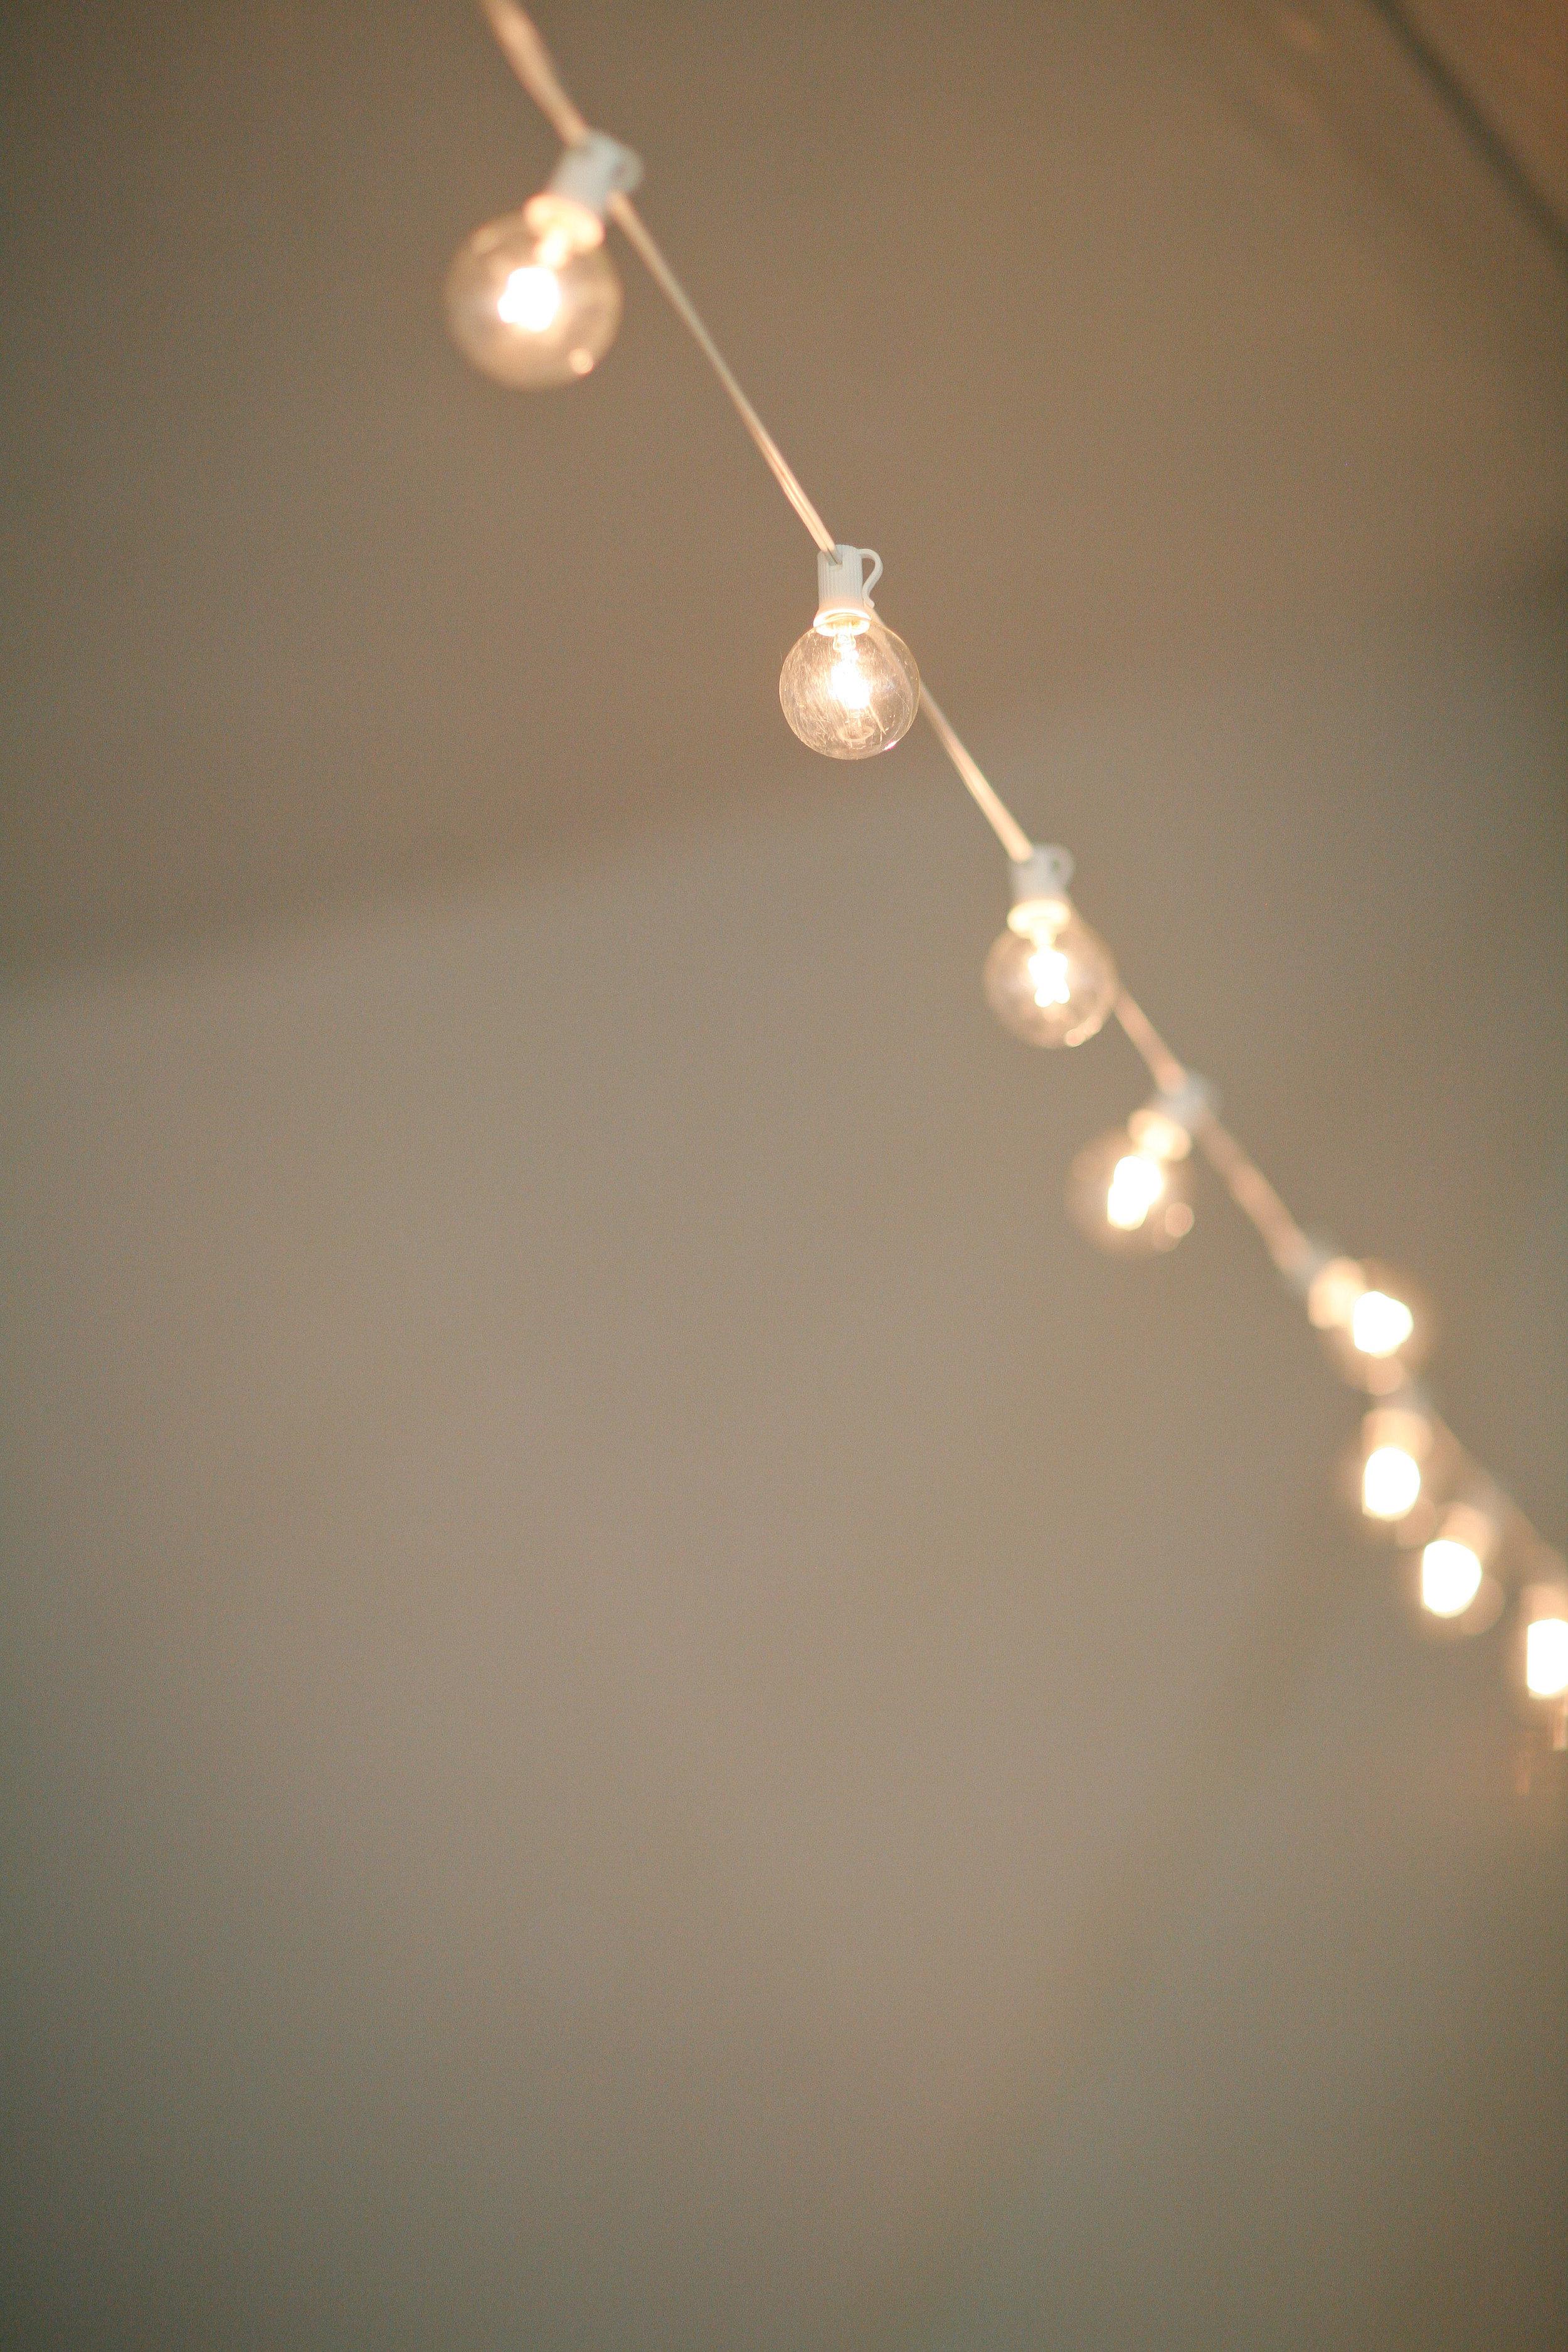 Cafe lighting in Quakertown, PA